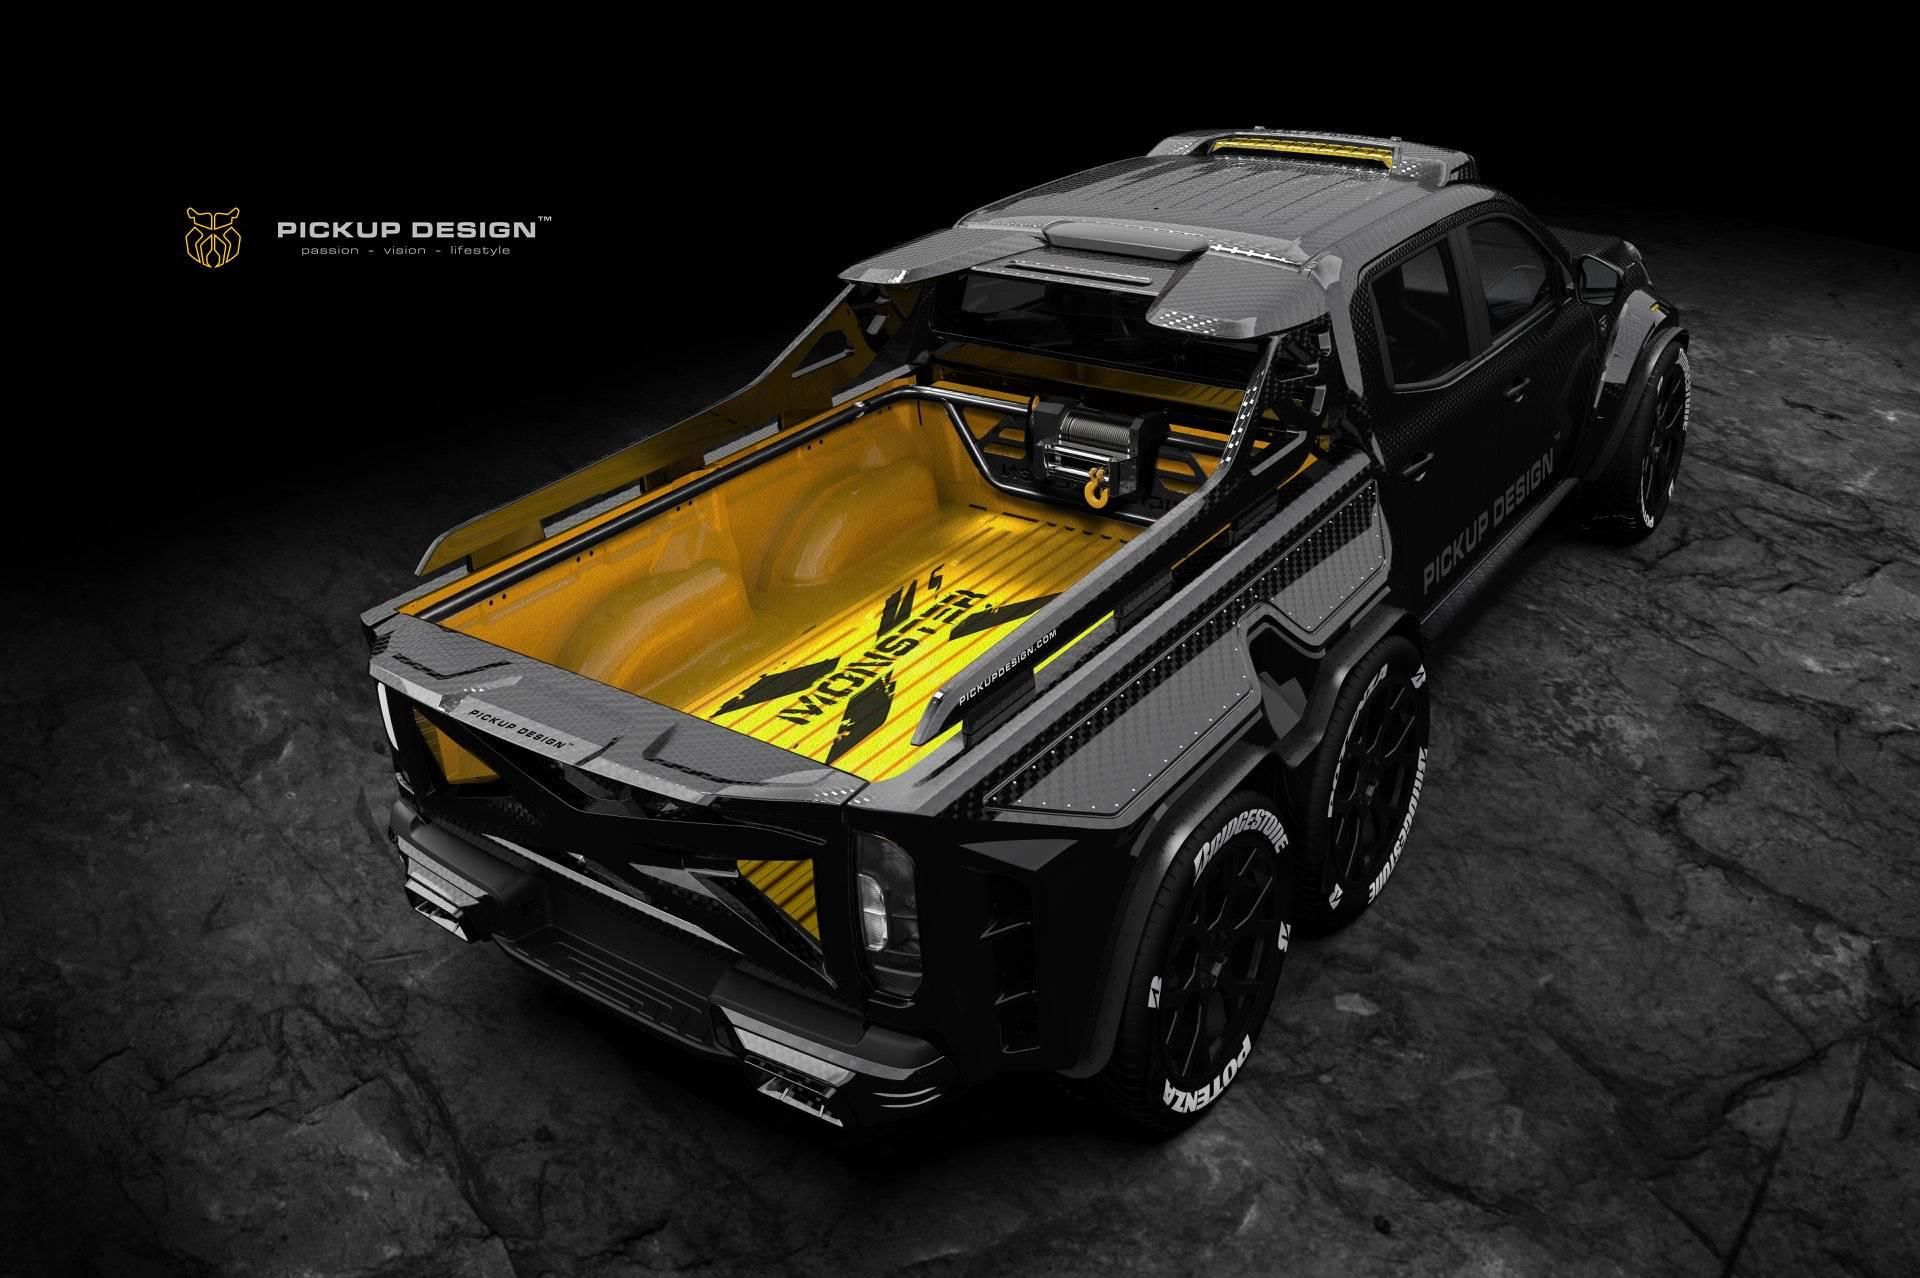 Carlex Design Exy Monster X concept